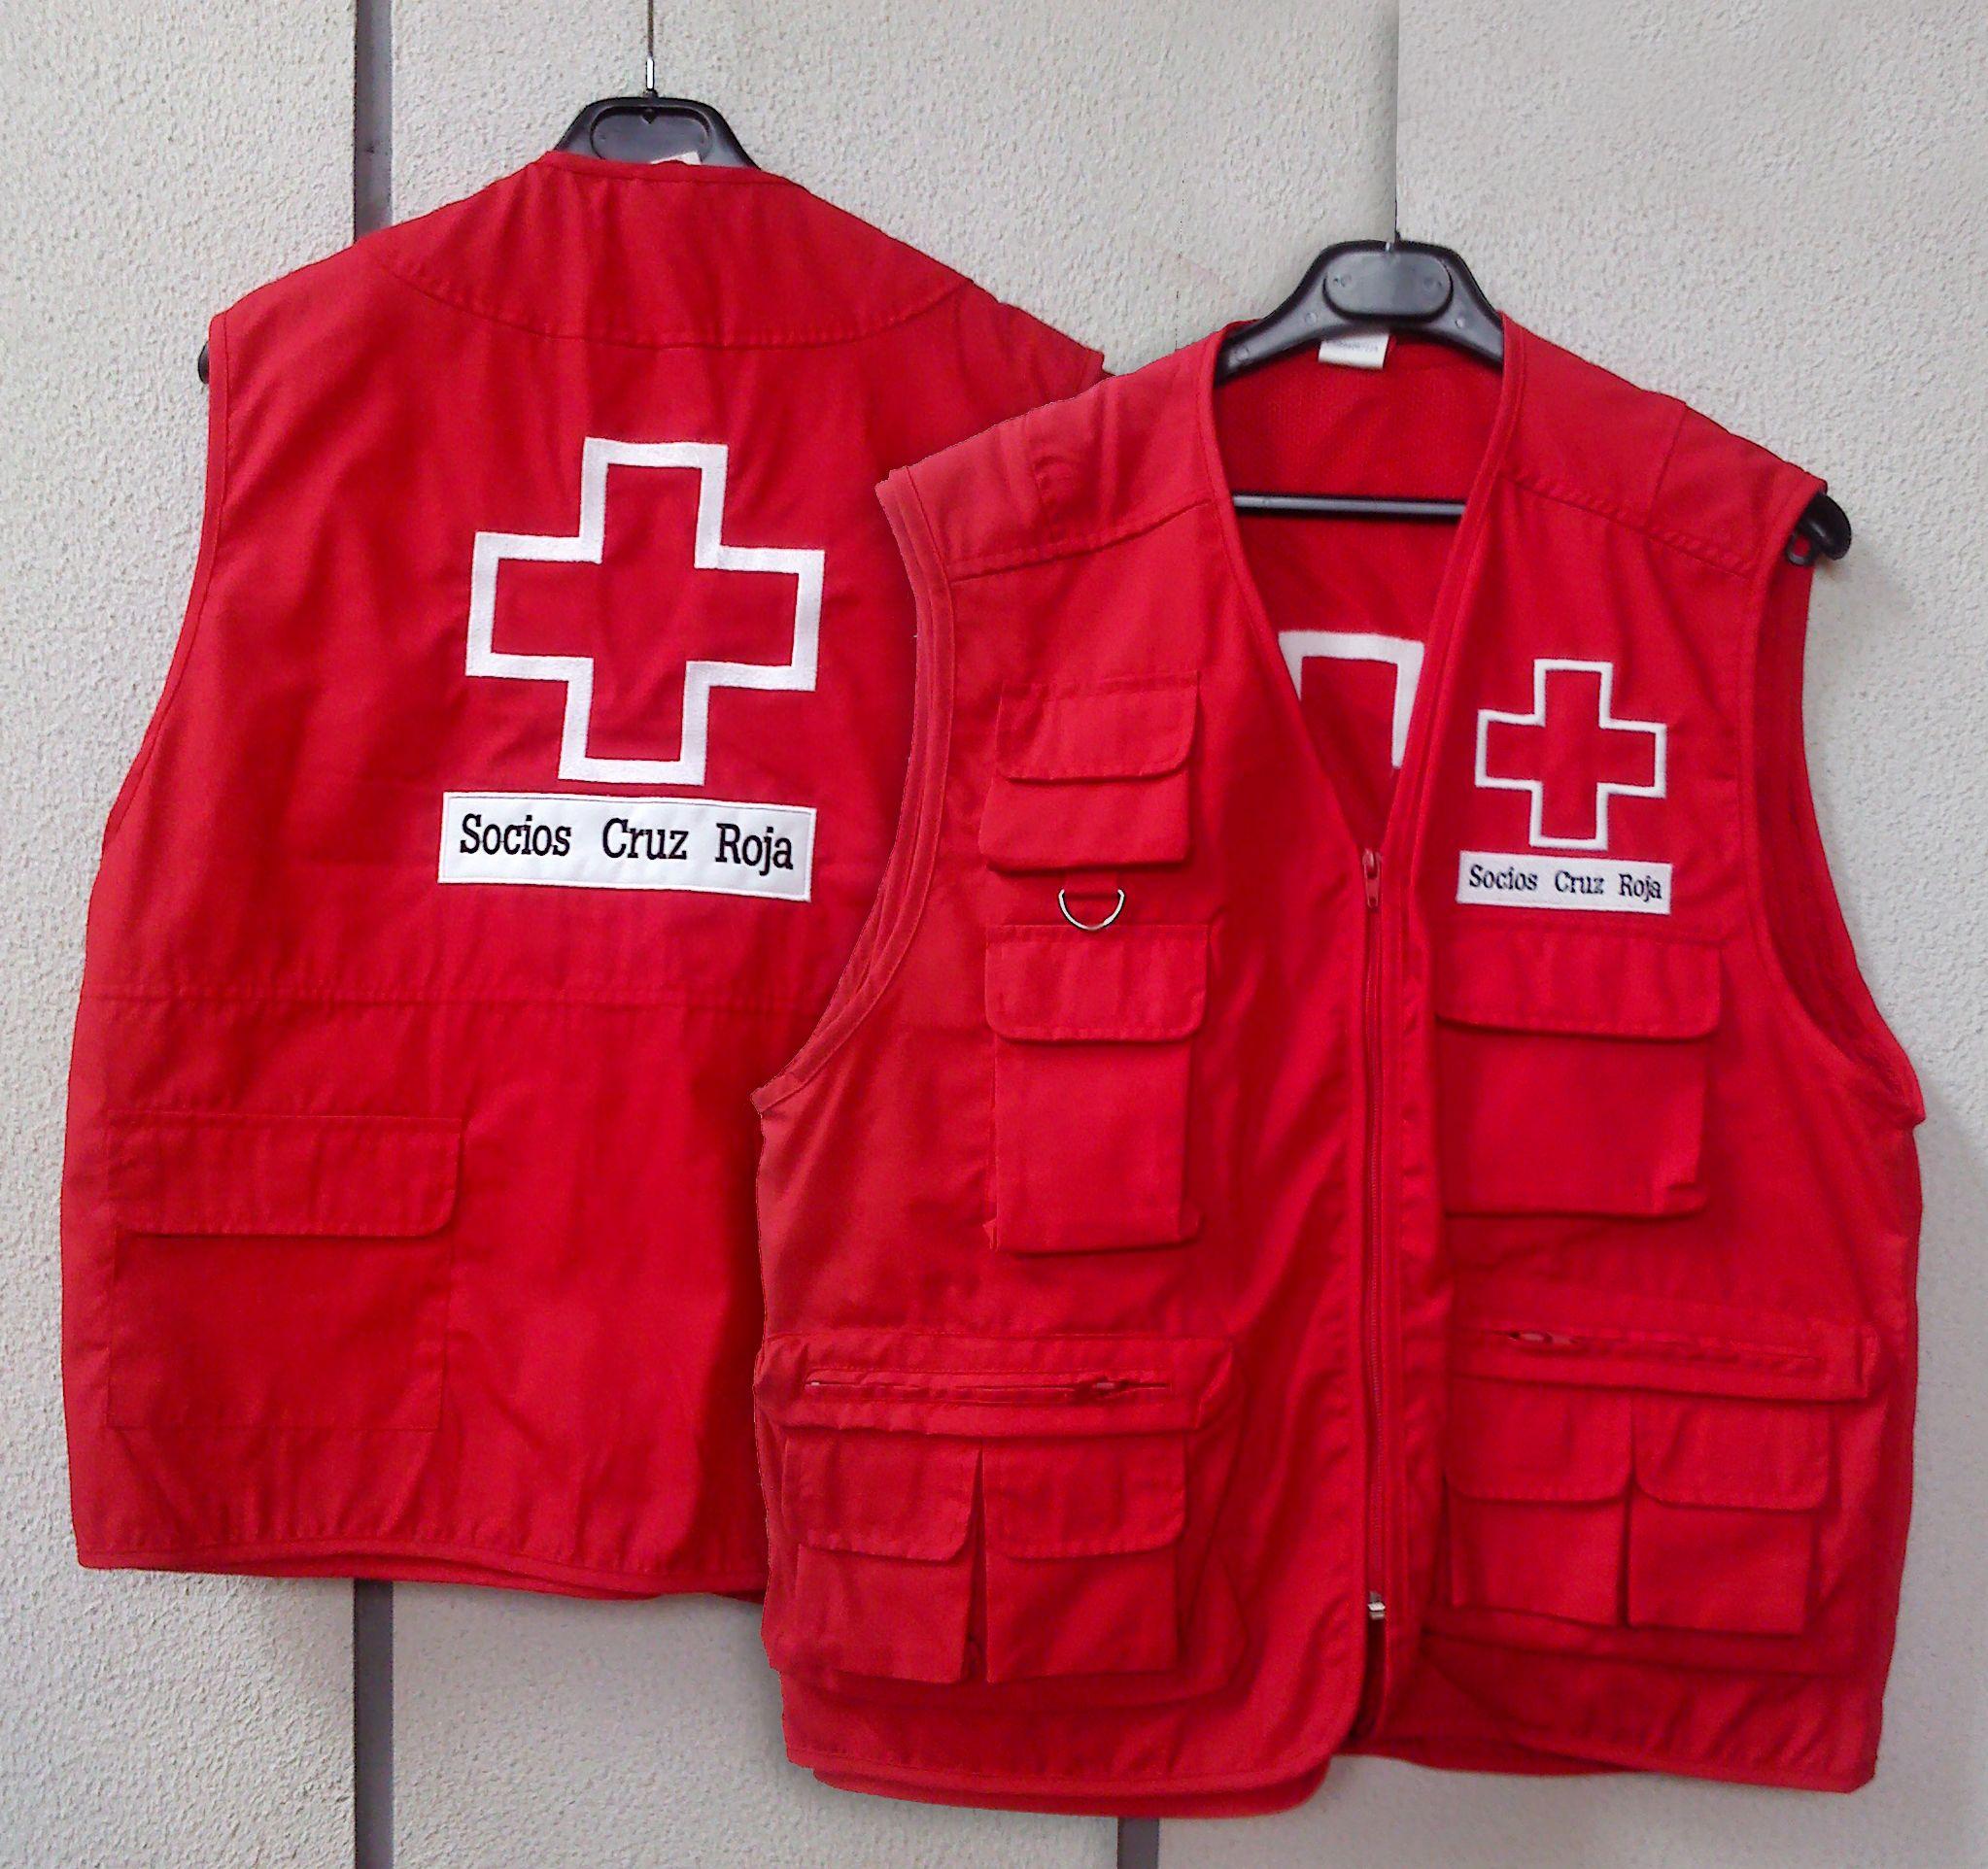 209adbe10 chalecos cruz roja - Realización de chalecos para captadores de Cruz Roja,  marcaje de logotipo bordado sobre tela.